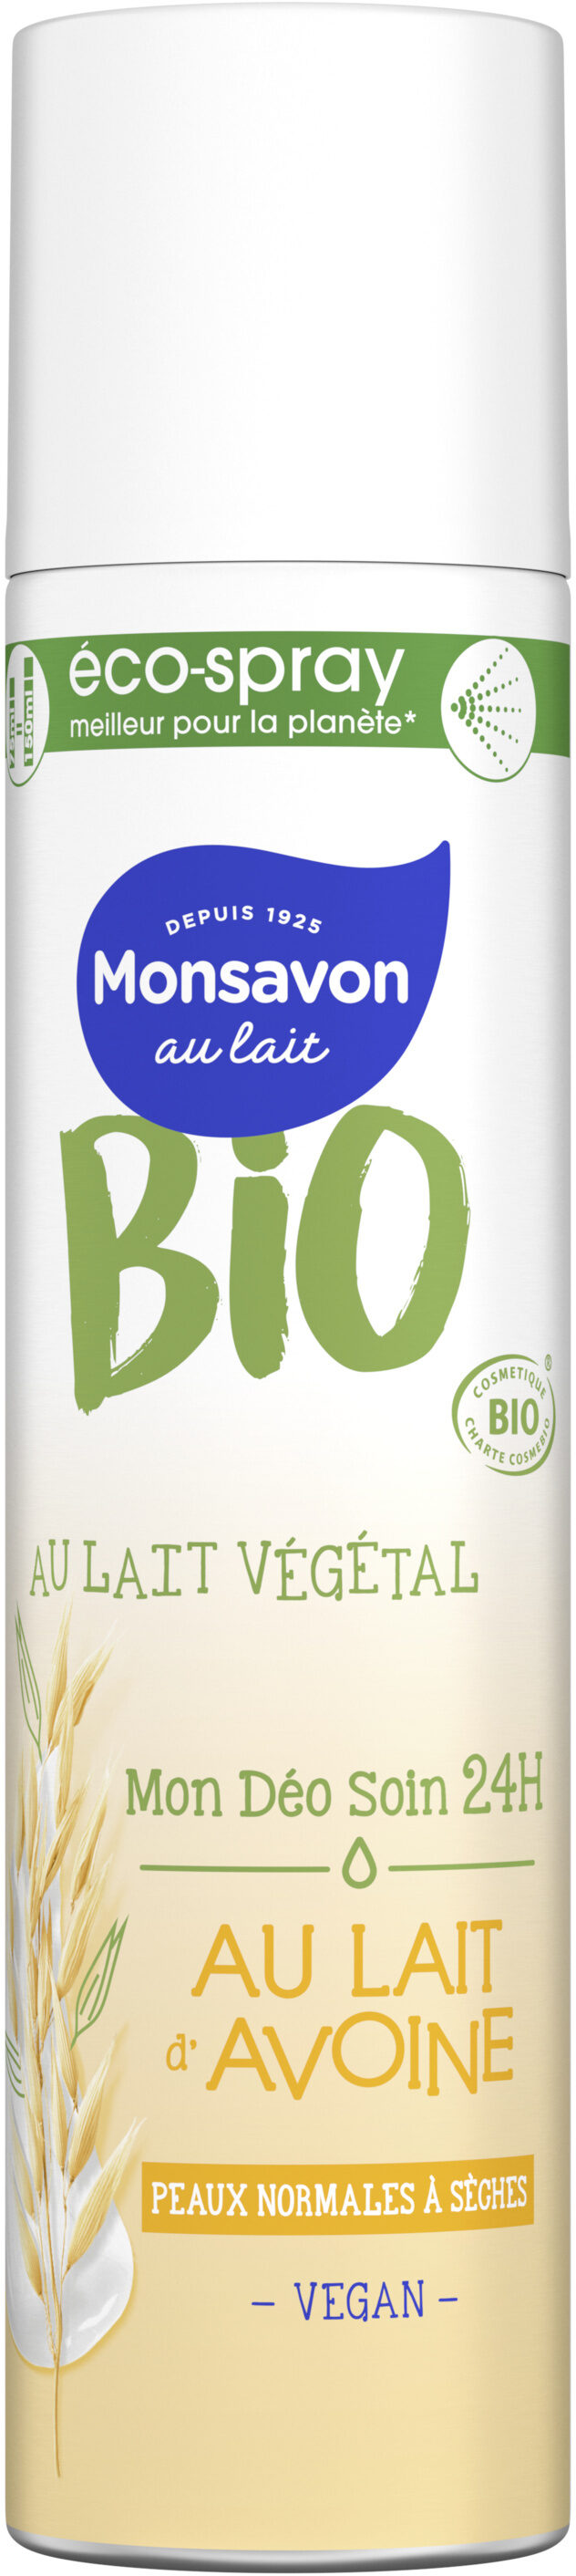 Monsavon Déodorant Spray Bio Lait Avoine - Product - fr